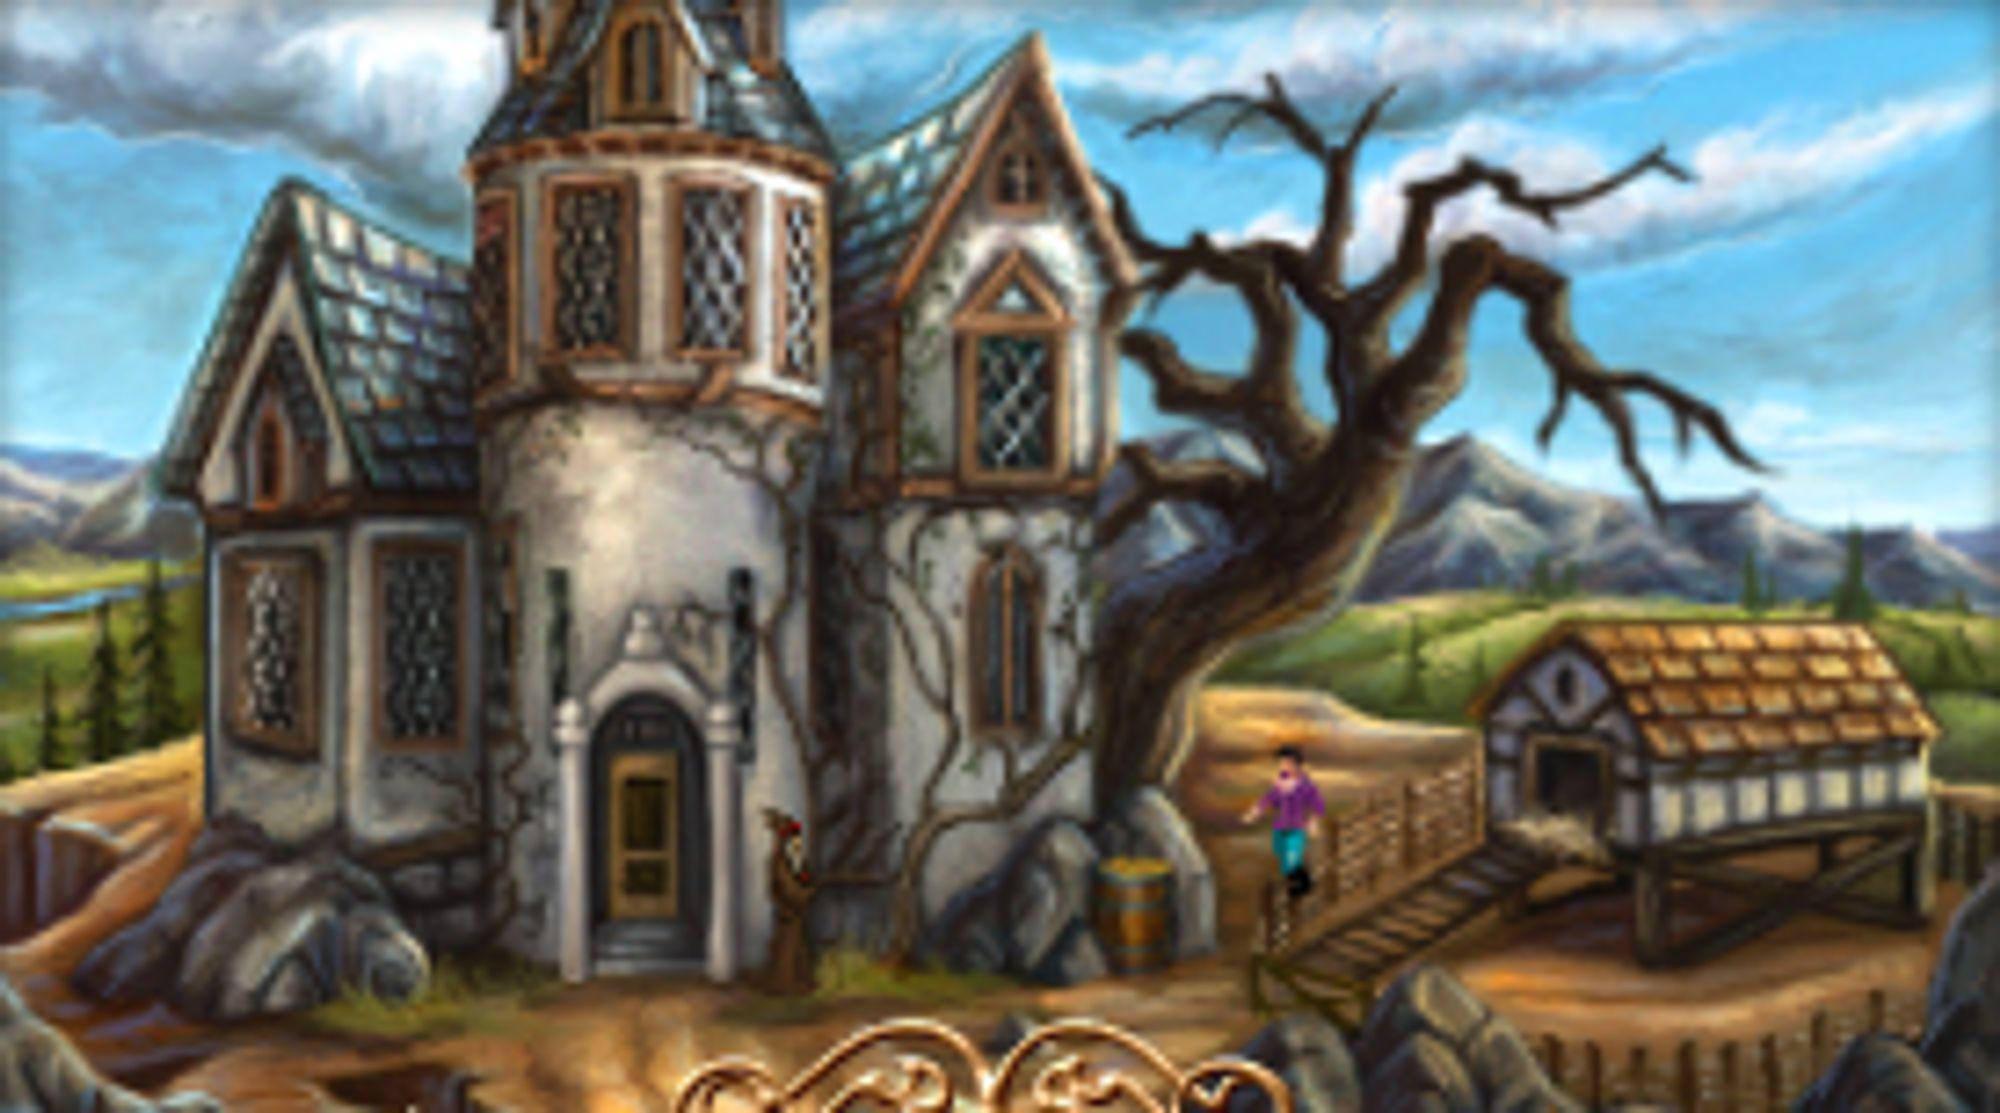 King's Quest III Redux (PC).